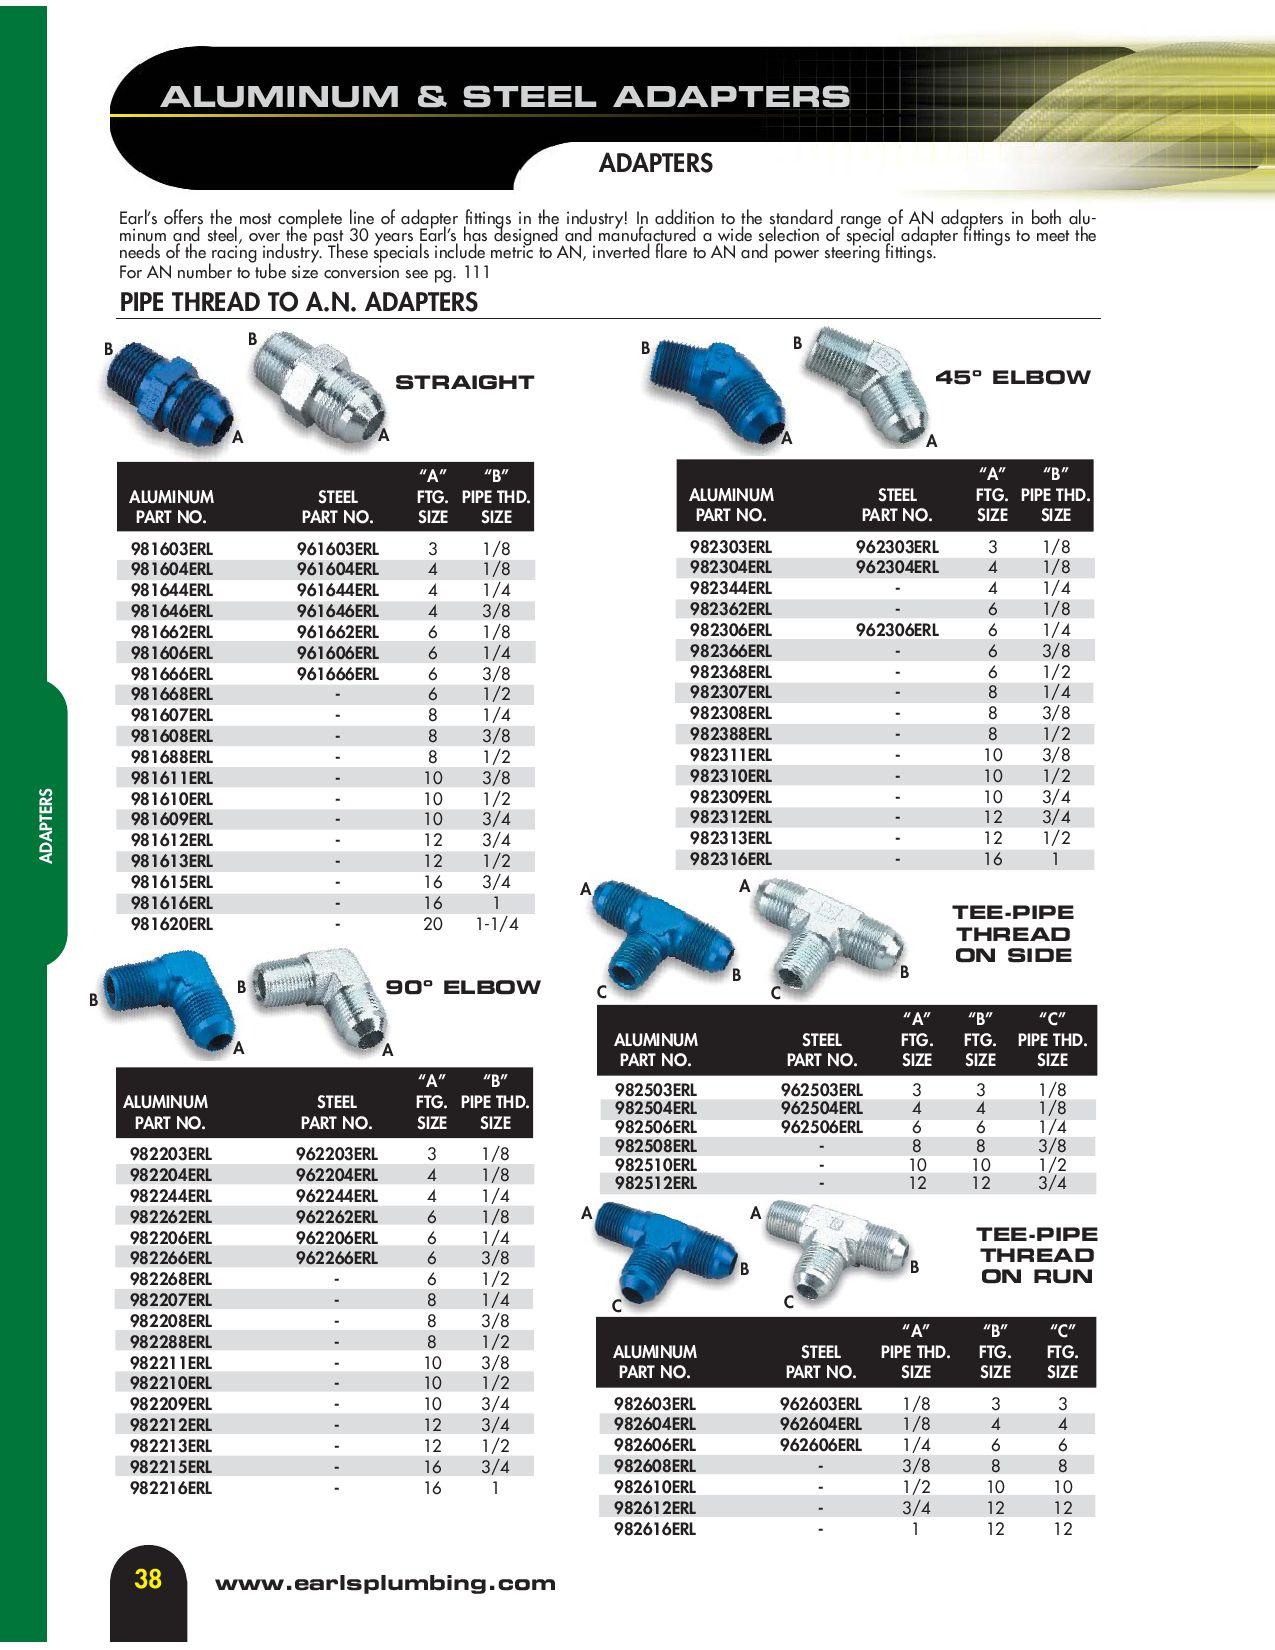 Earls 982310ERL Aluminum Adapter